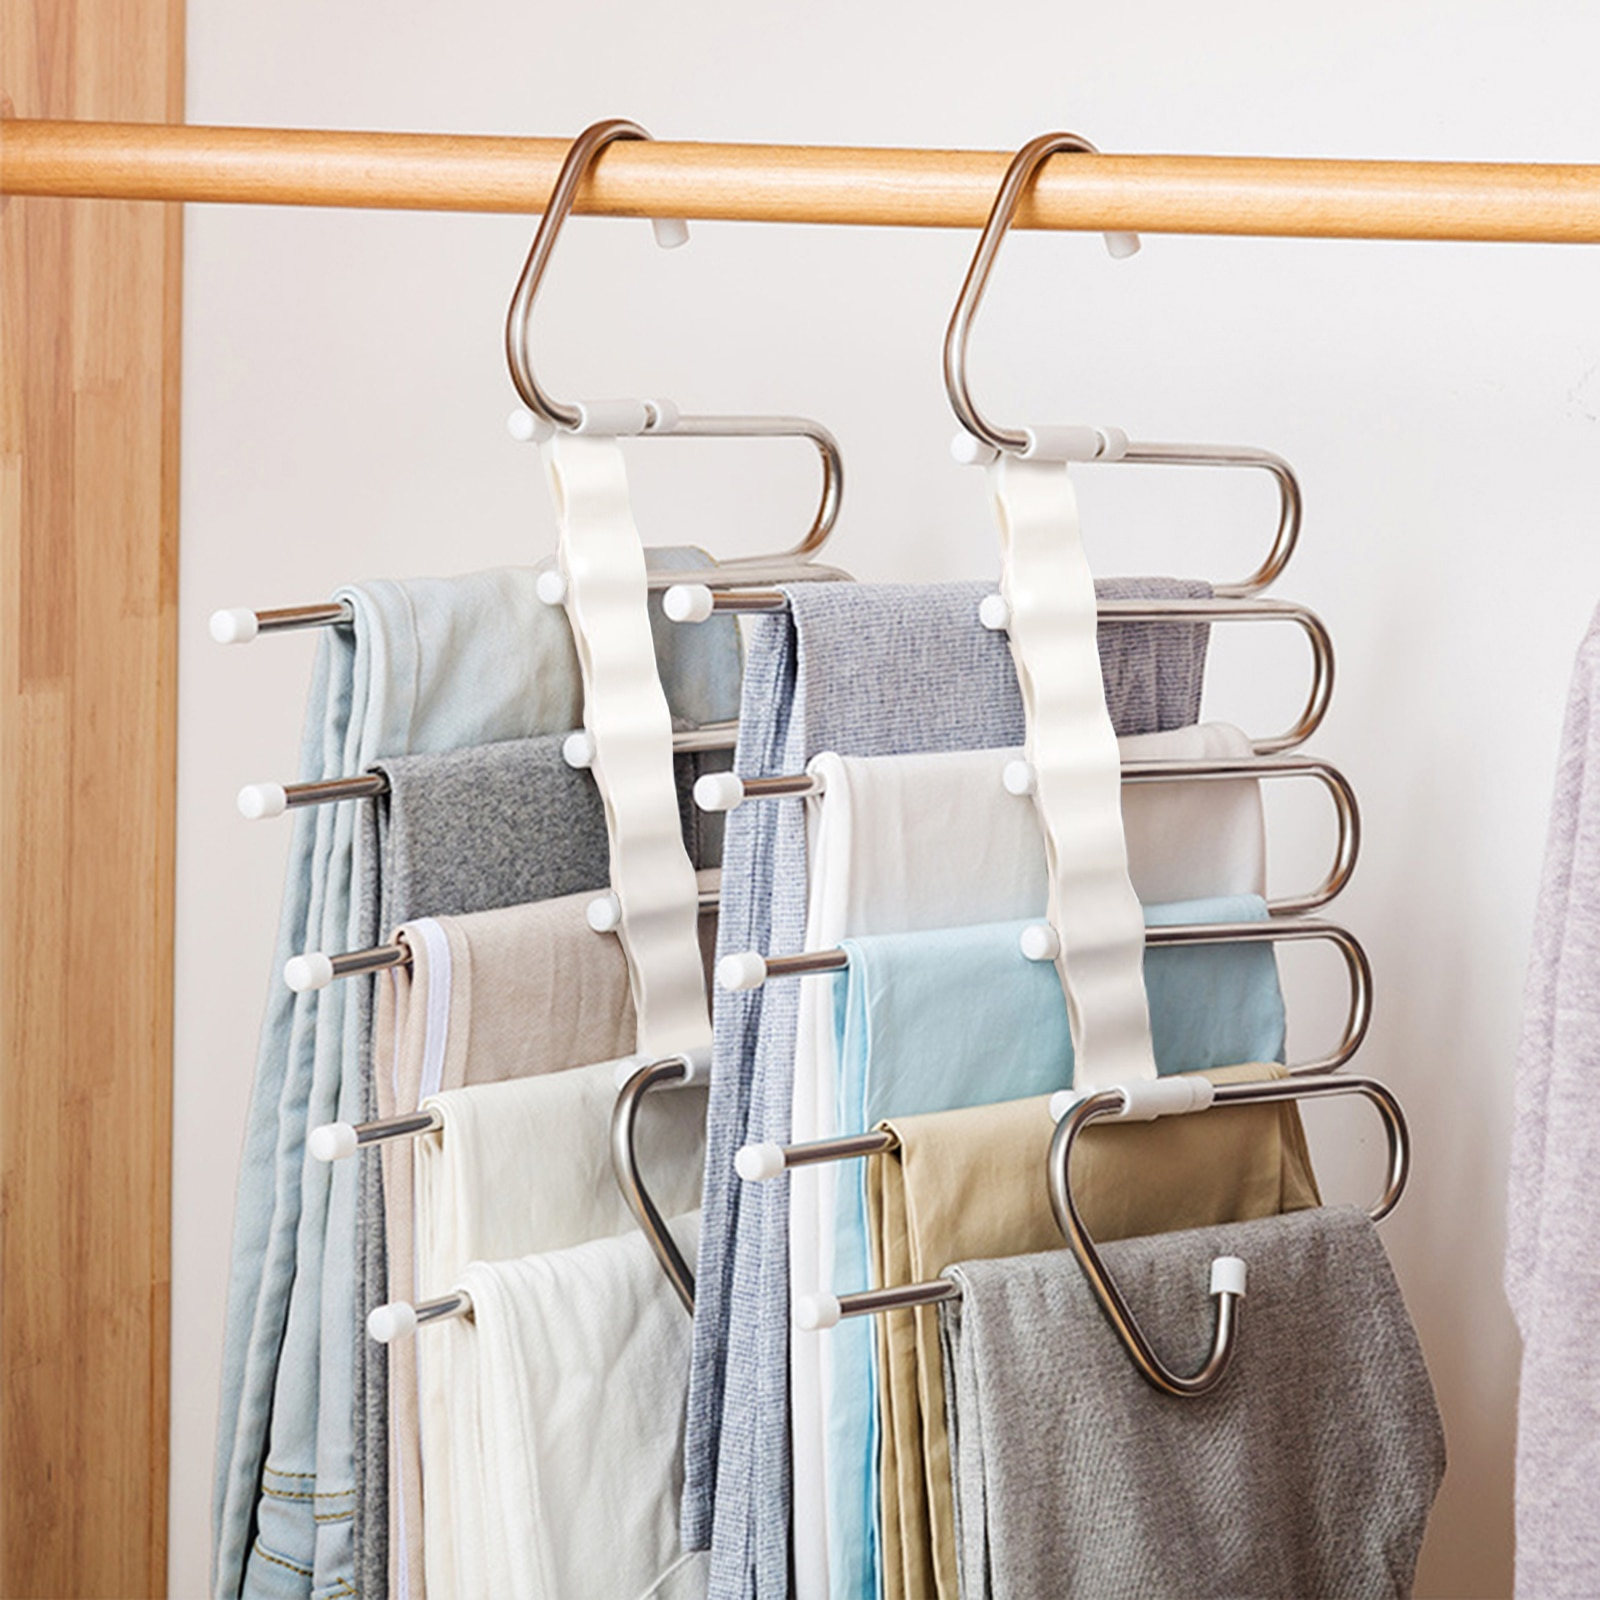 5 in 1 Pant Rack Hangers for Clothes Multifunction Shelves Wardrobe Closet Storage Organizer StainlessSteel Magic Trouser Hanger